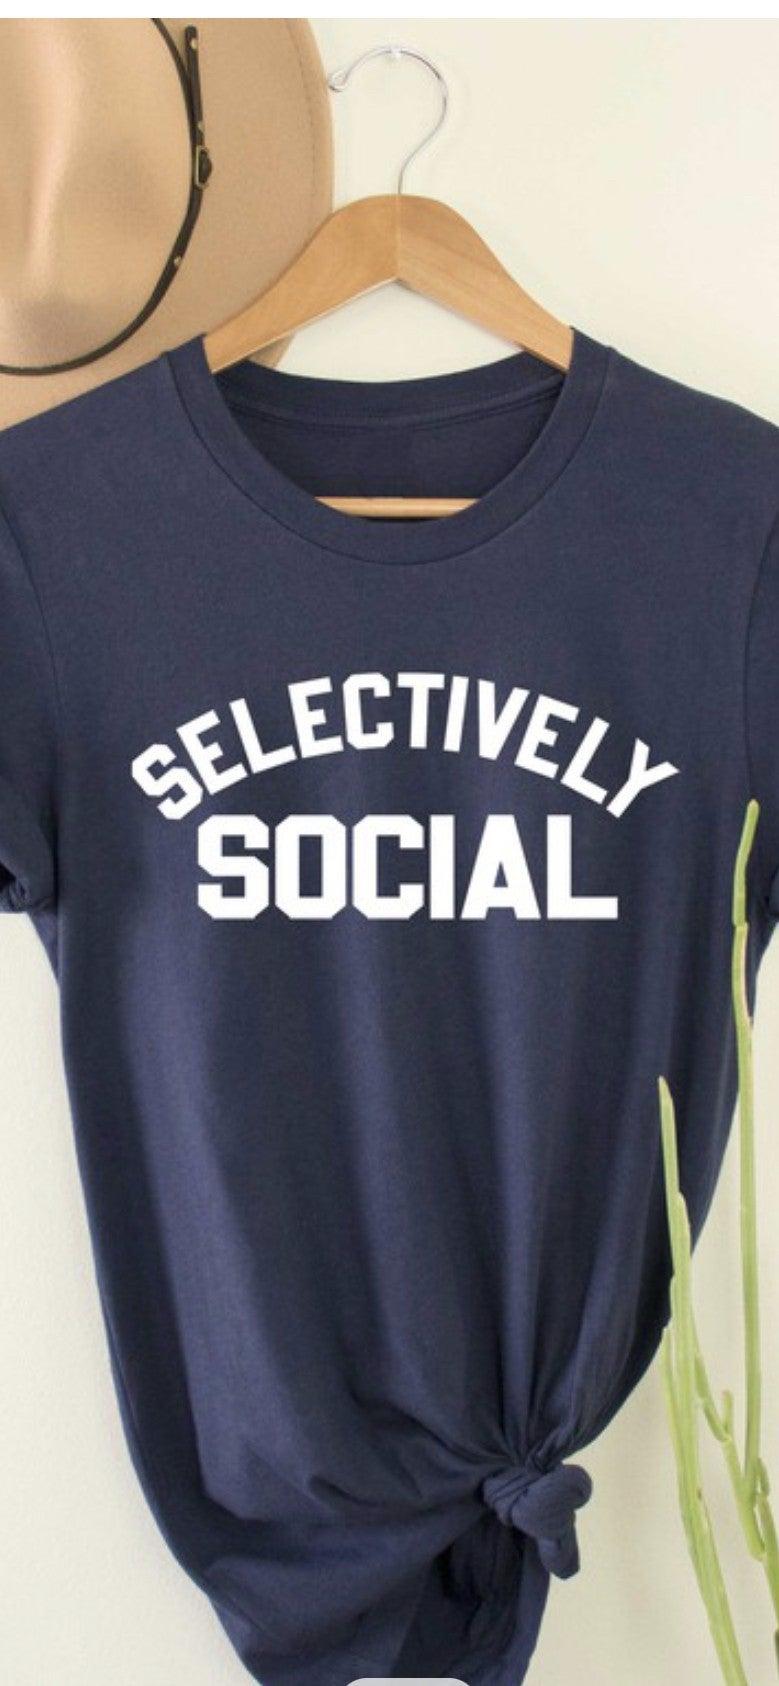 Selectively Social Tee